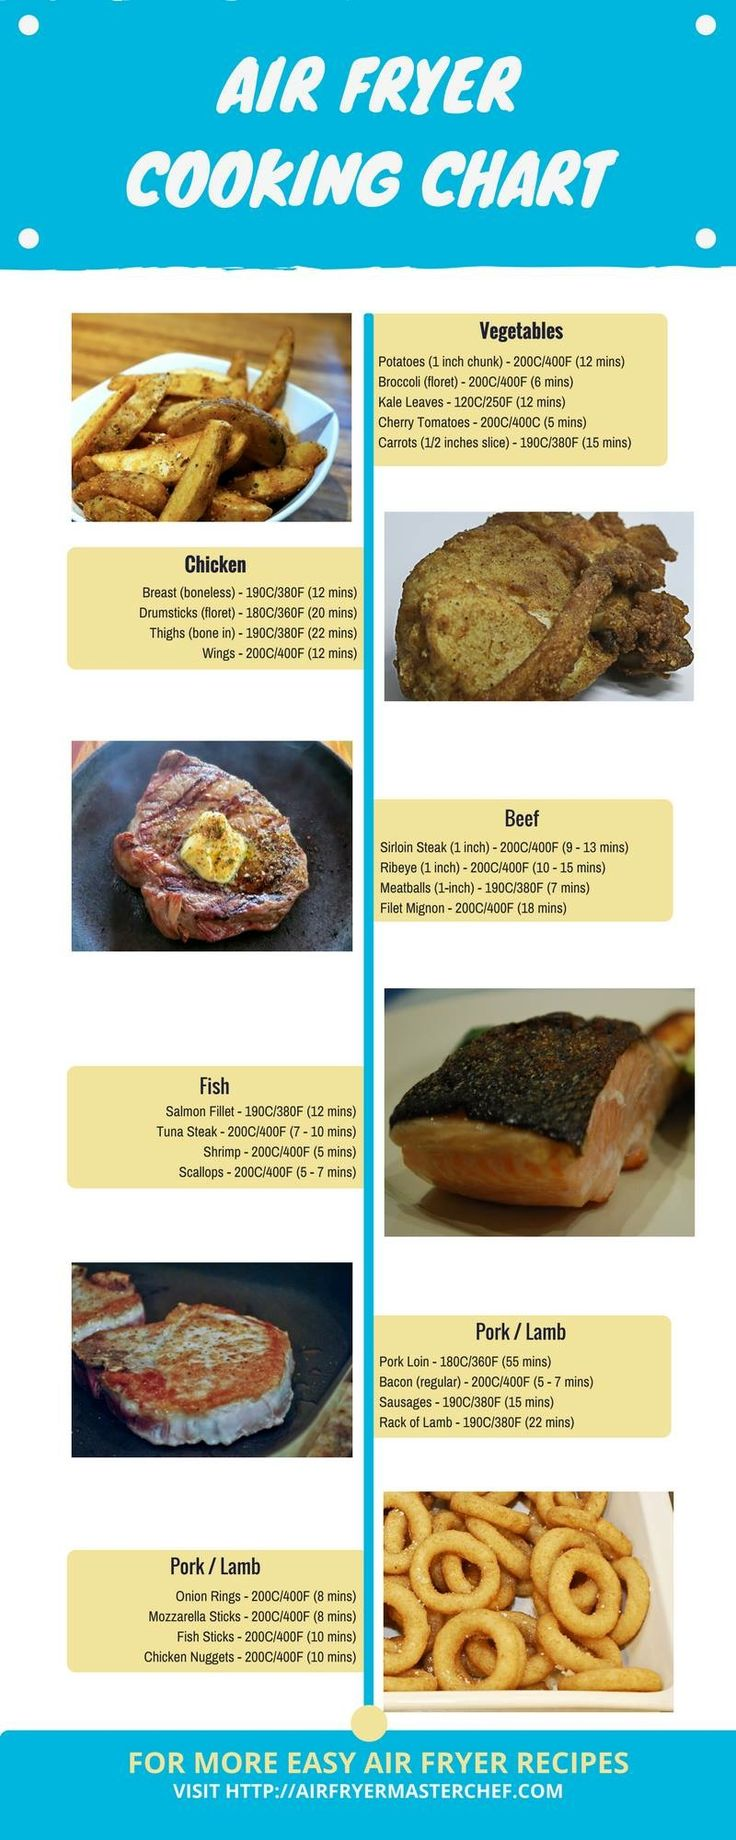 Air fryer cooking chart